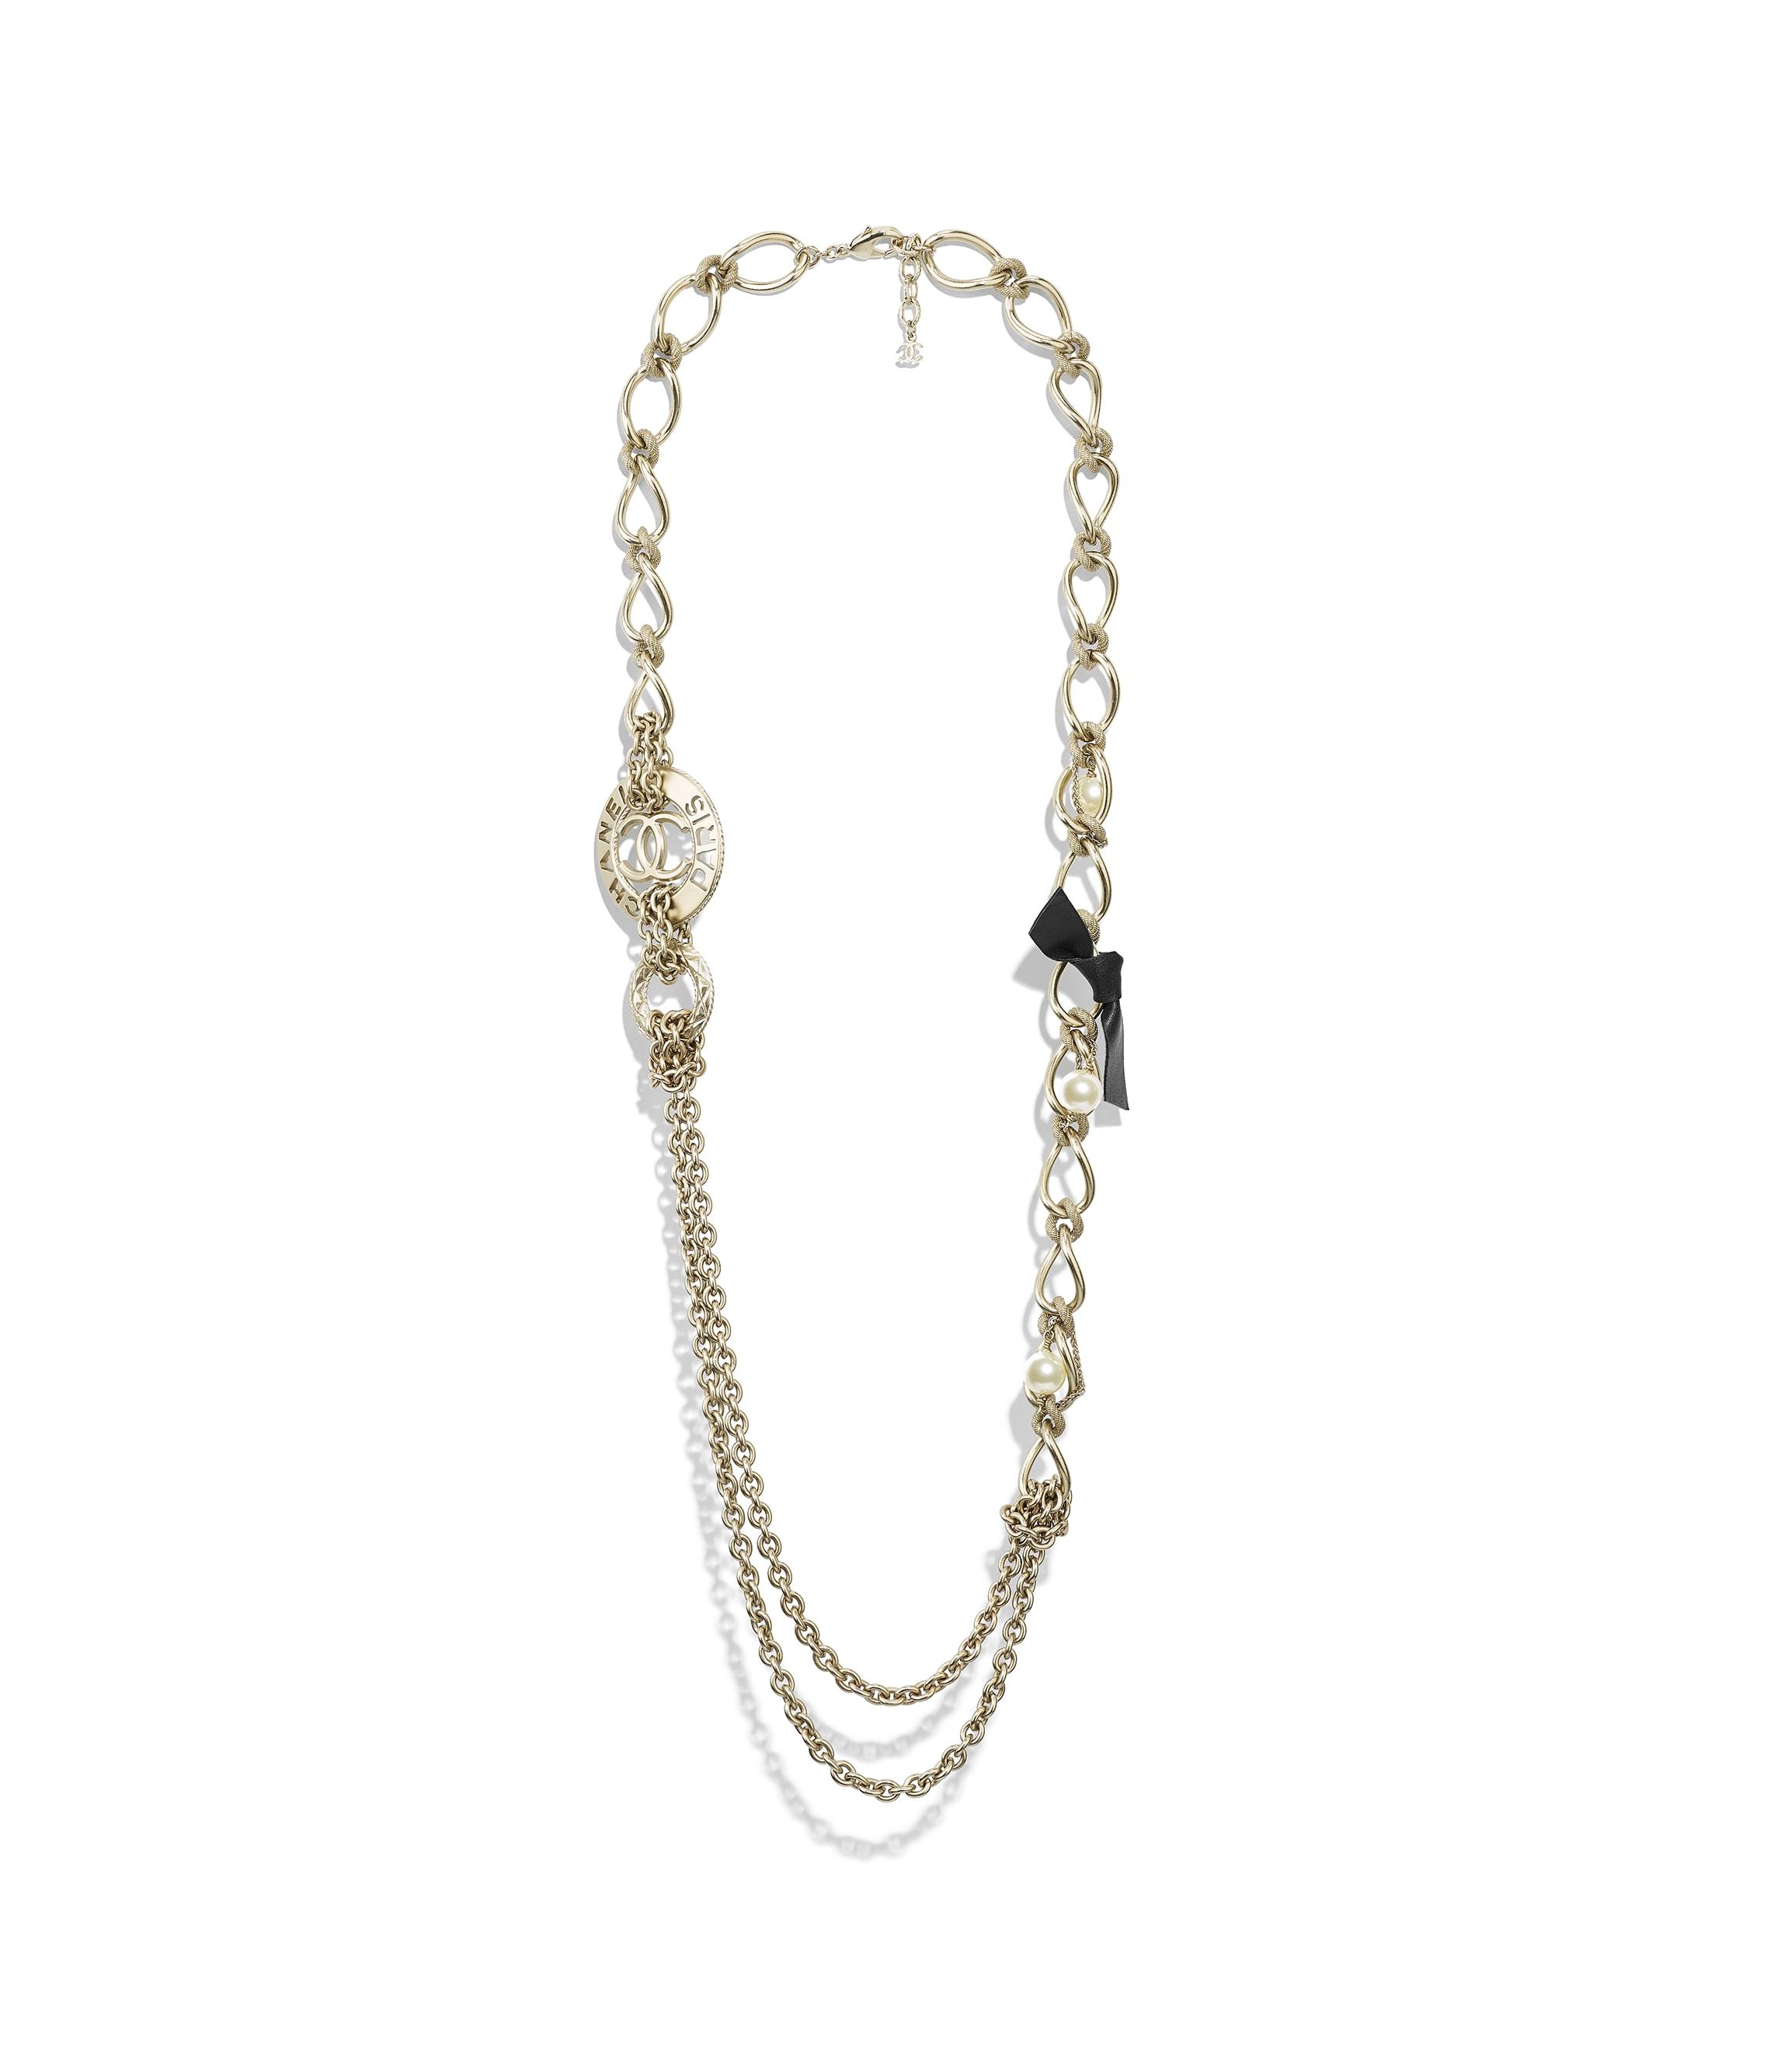 Jawelry